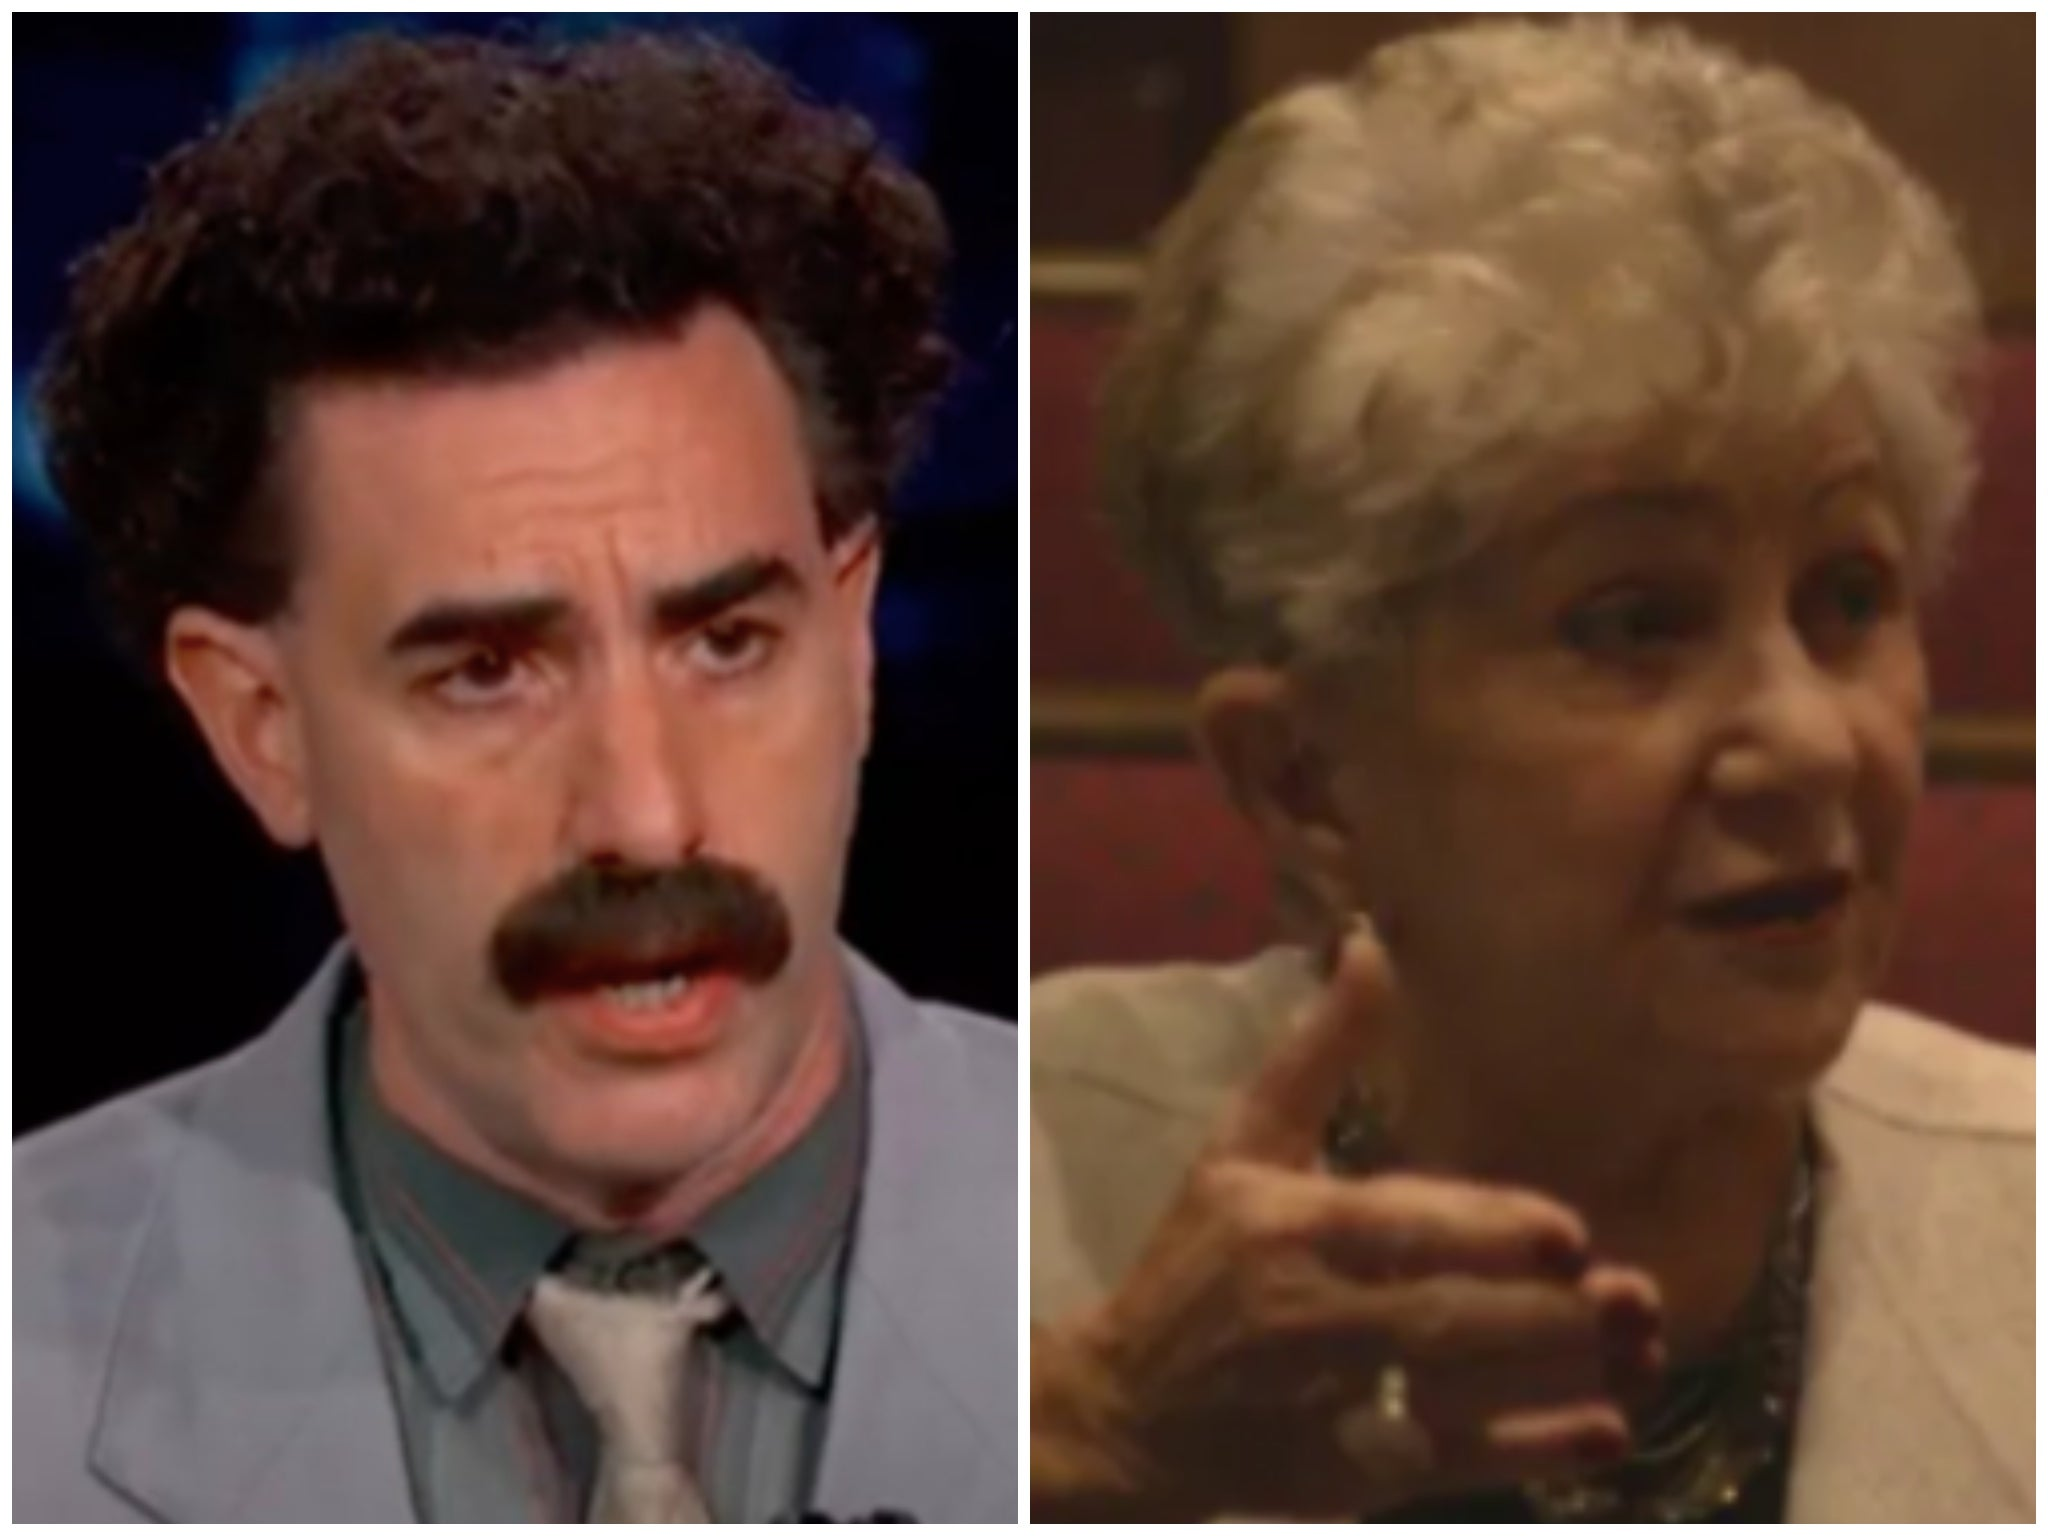 When exactly did Sacha Baron Cohen reveal his identity to Judith Dim Evans in Borat 2?